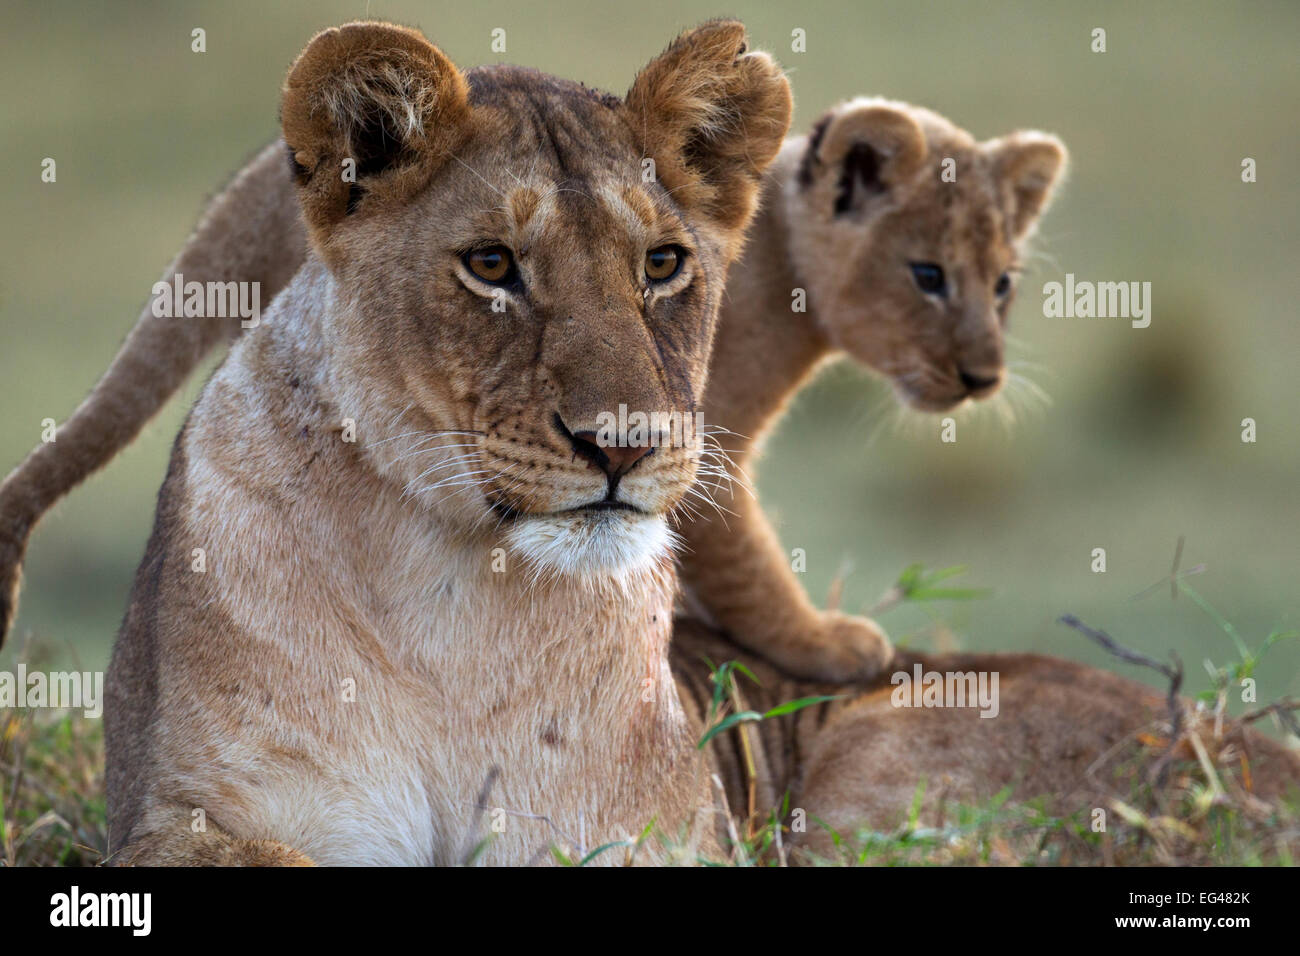 Löwin (Panthera Leo) Jungtier im Alter von 2-3 Monaten Porträt. Masai Mara National Reserve Kenia August Stockbild